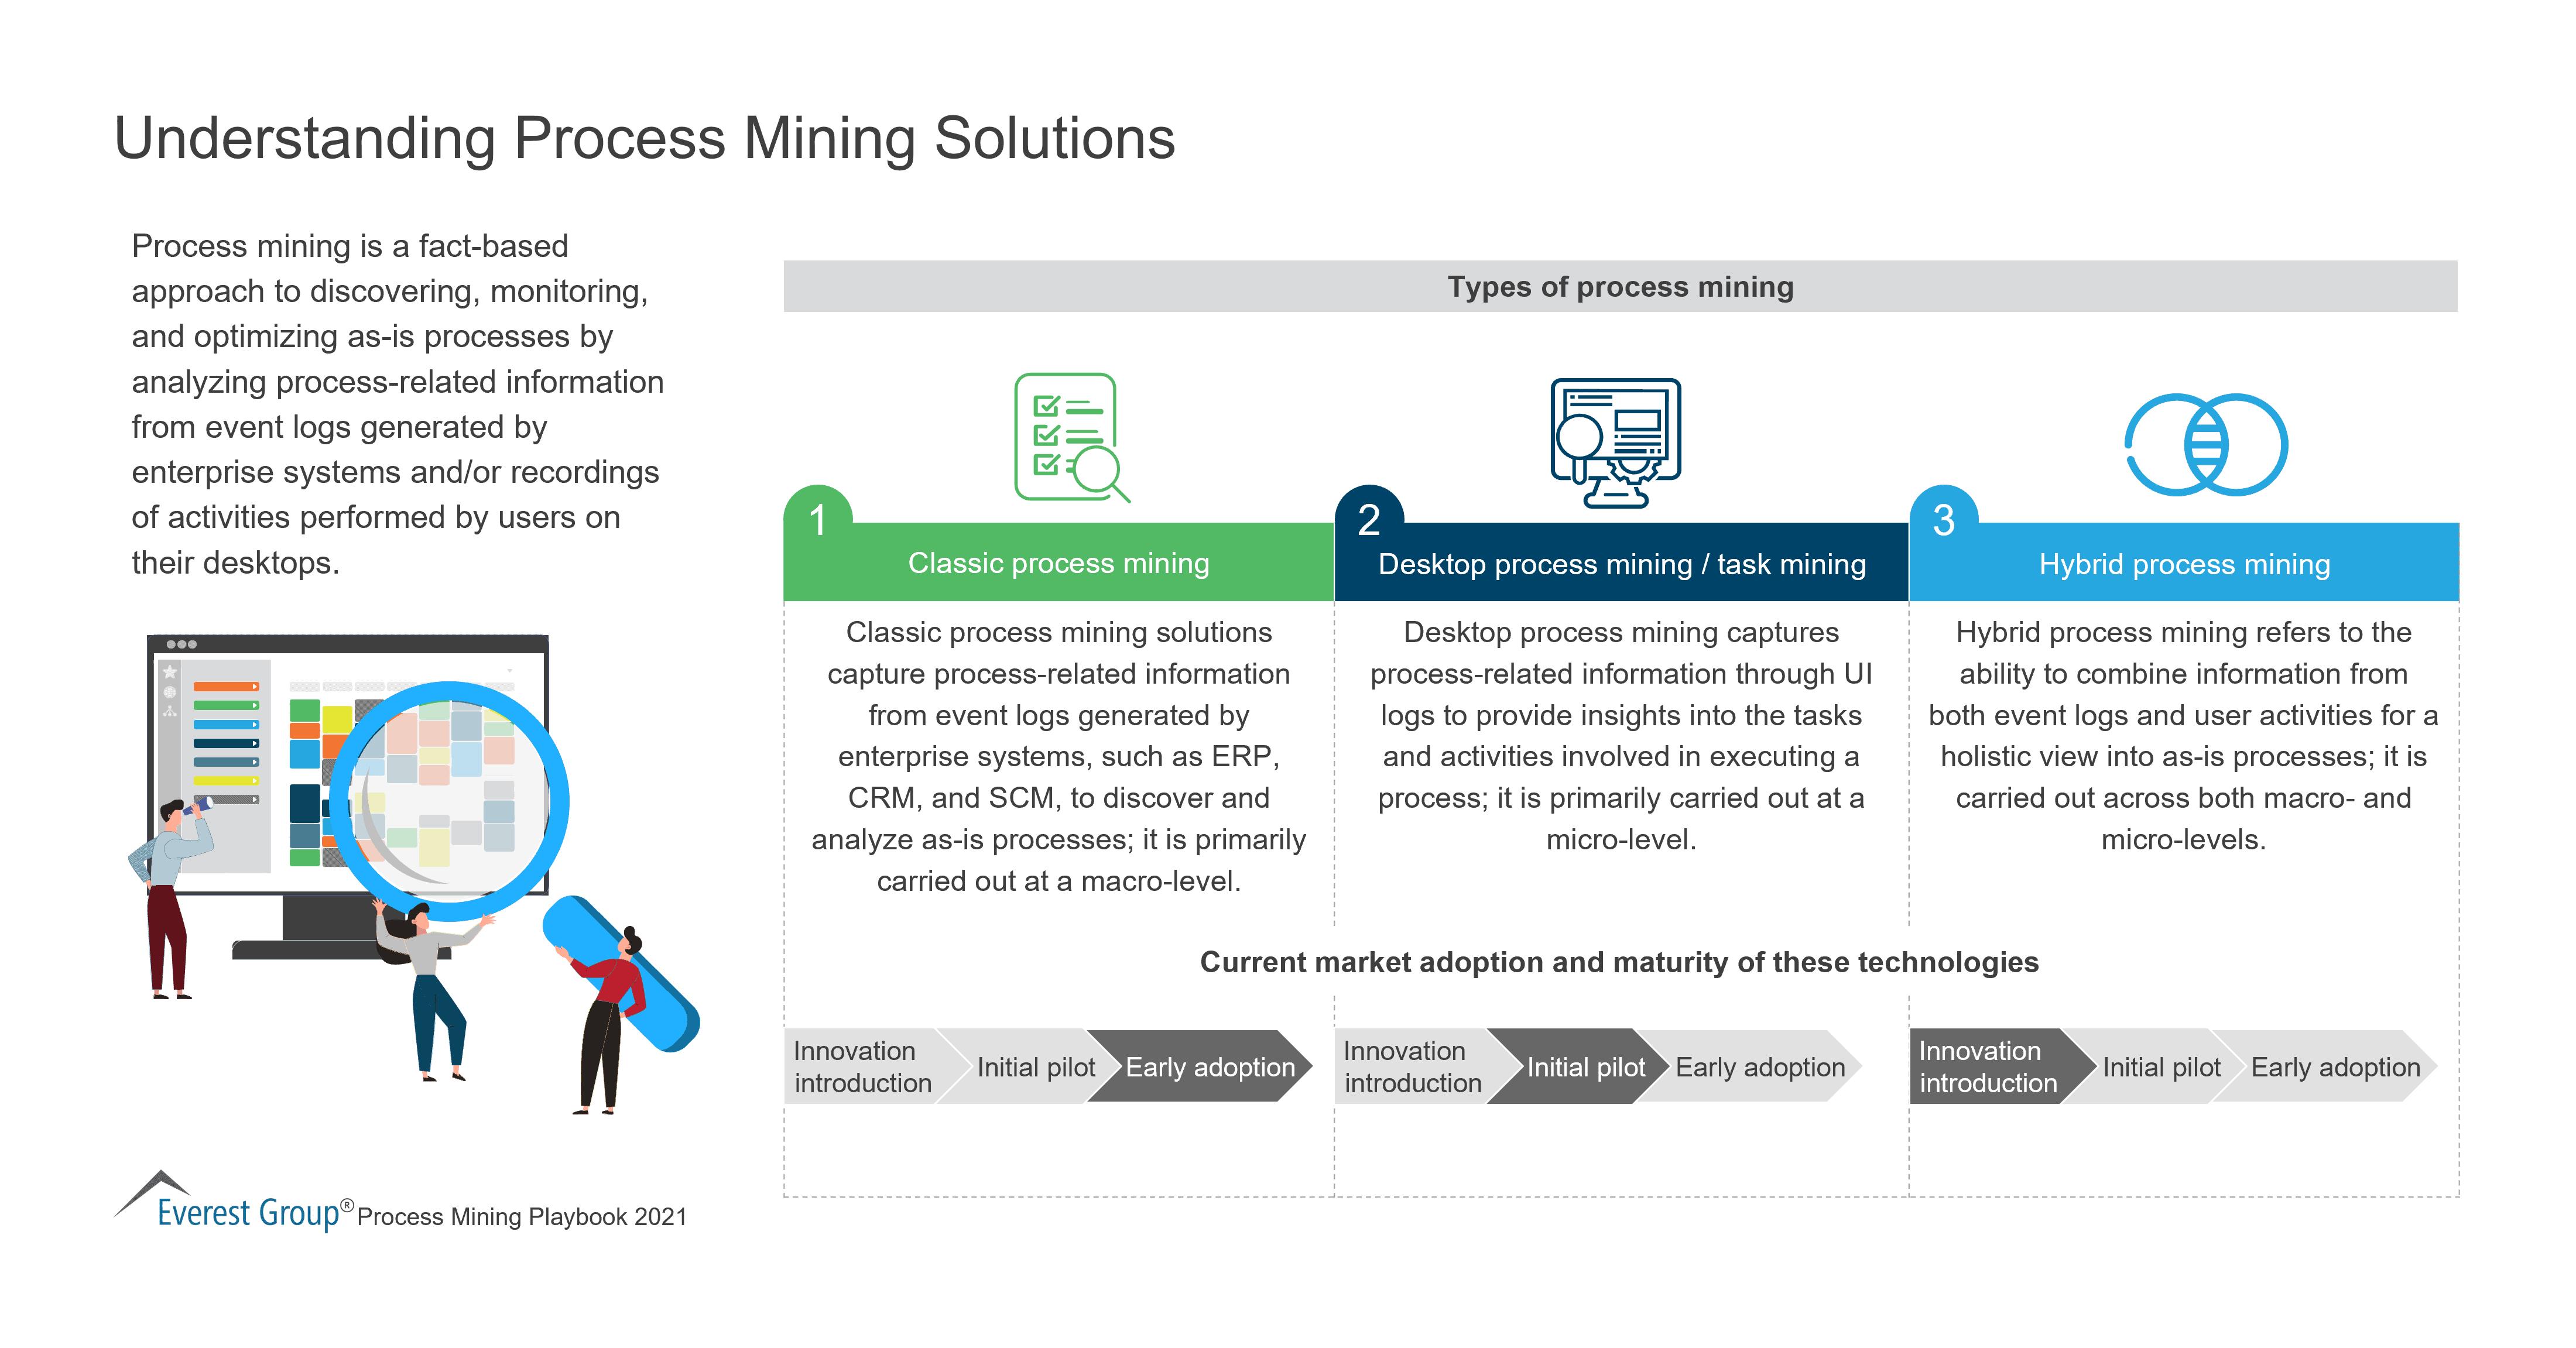 Understanding Process Mining Solutions